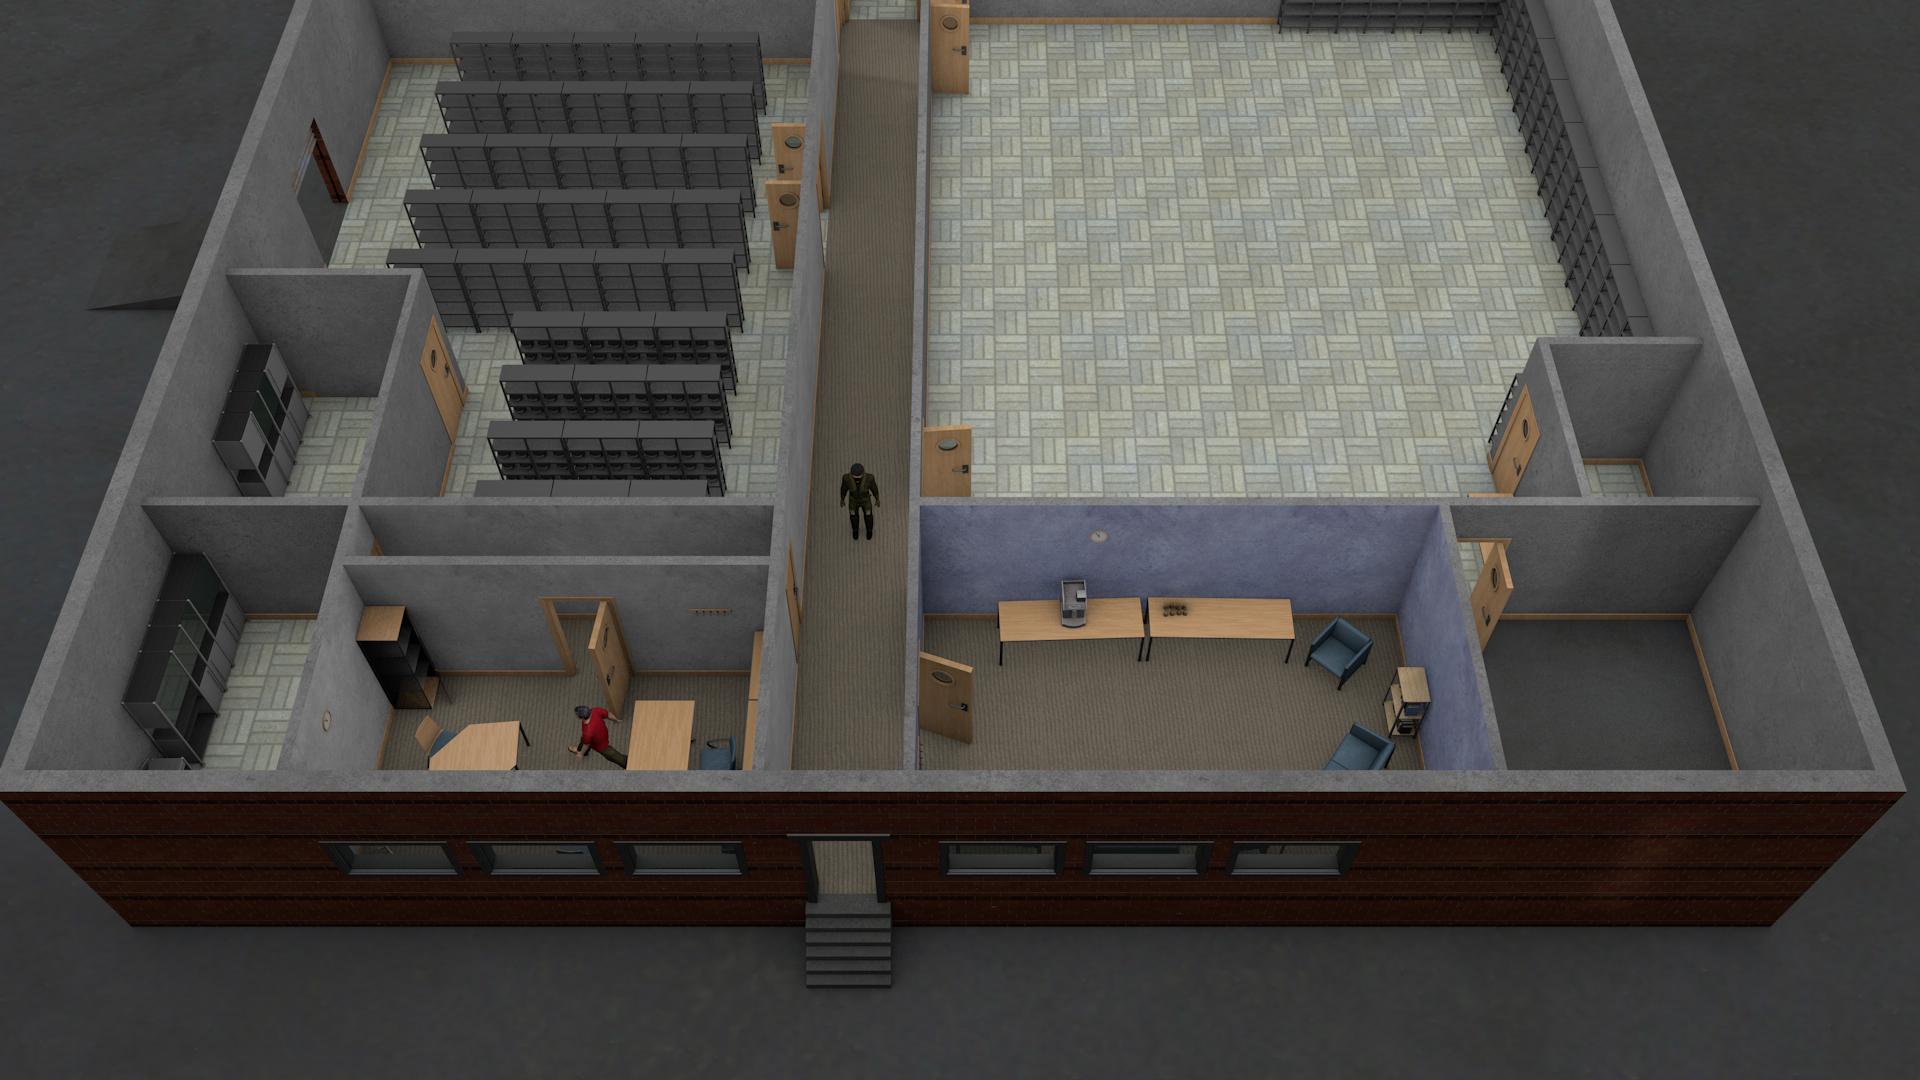 Servicing facility entrance